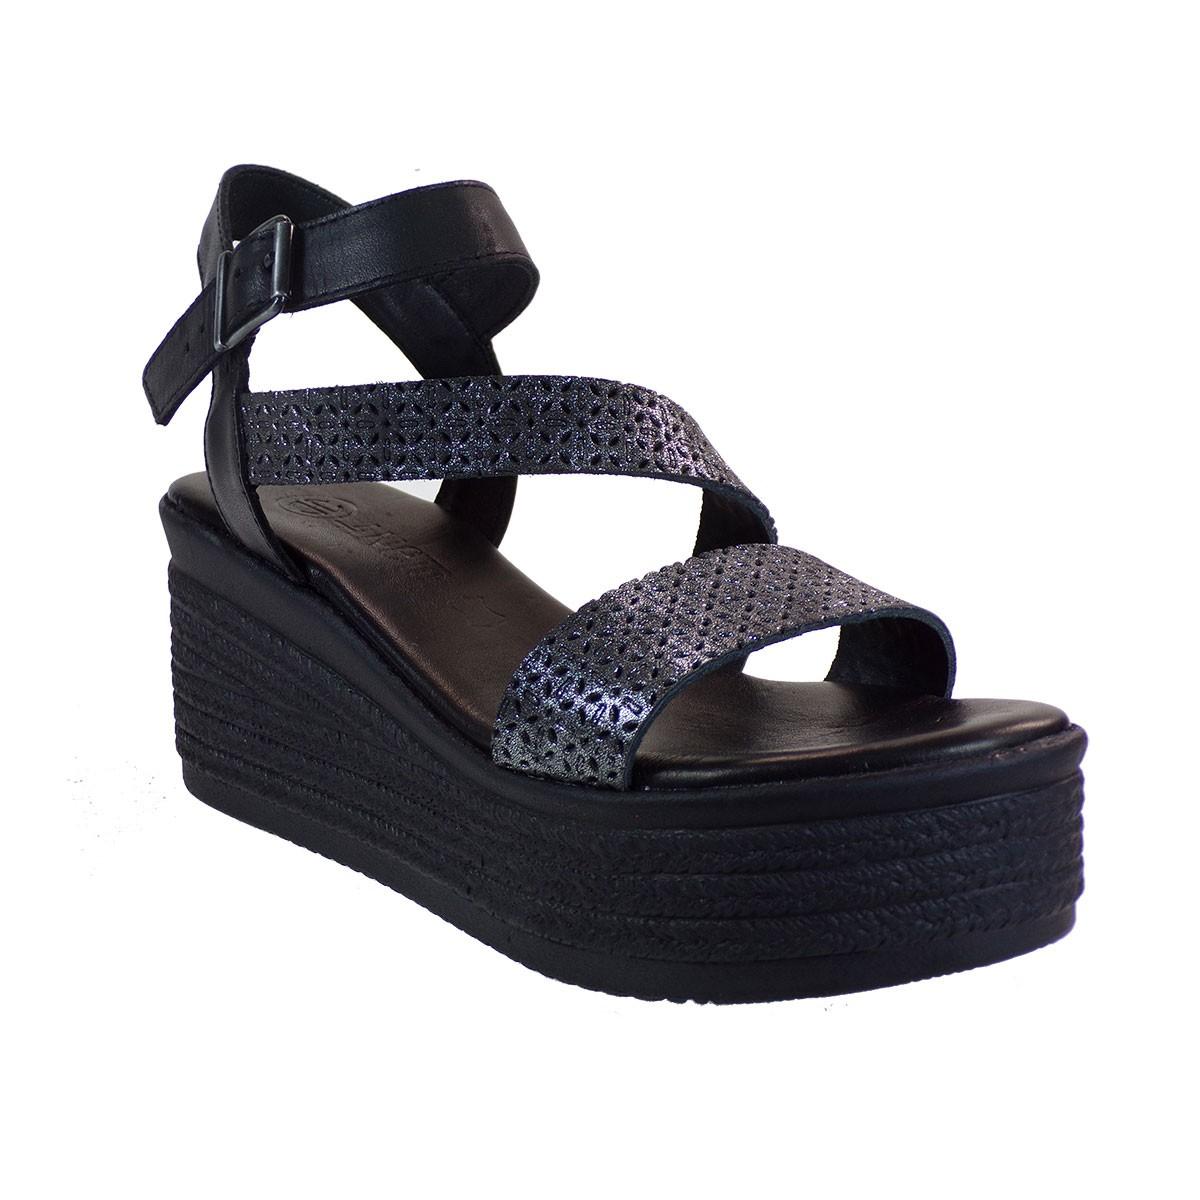 Katia Shoes Γυναικεία Πέδιλα Πλατφόρμες Κ139-1103 Ασταλί-Μαύρο Δέρμα